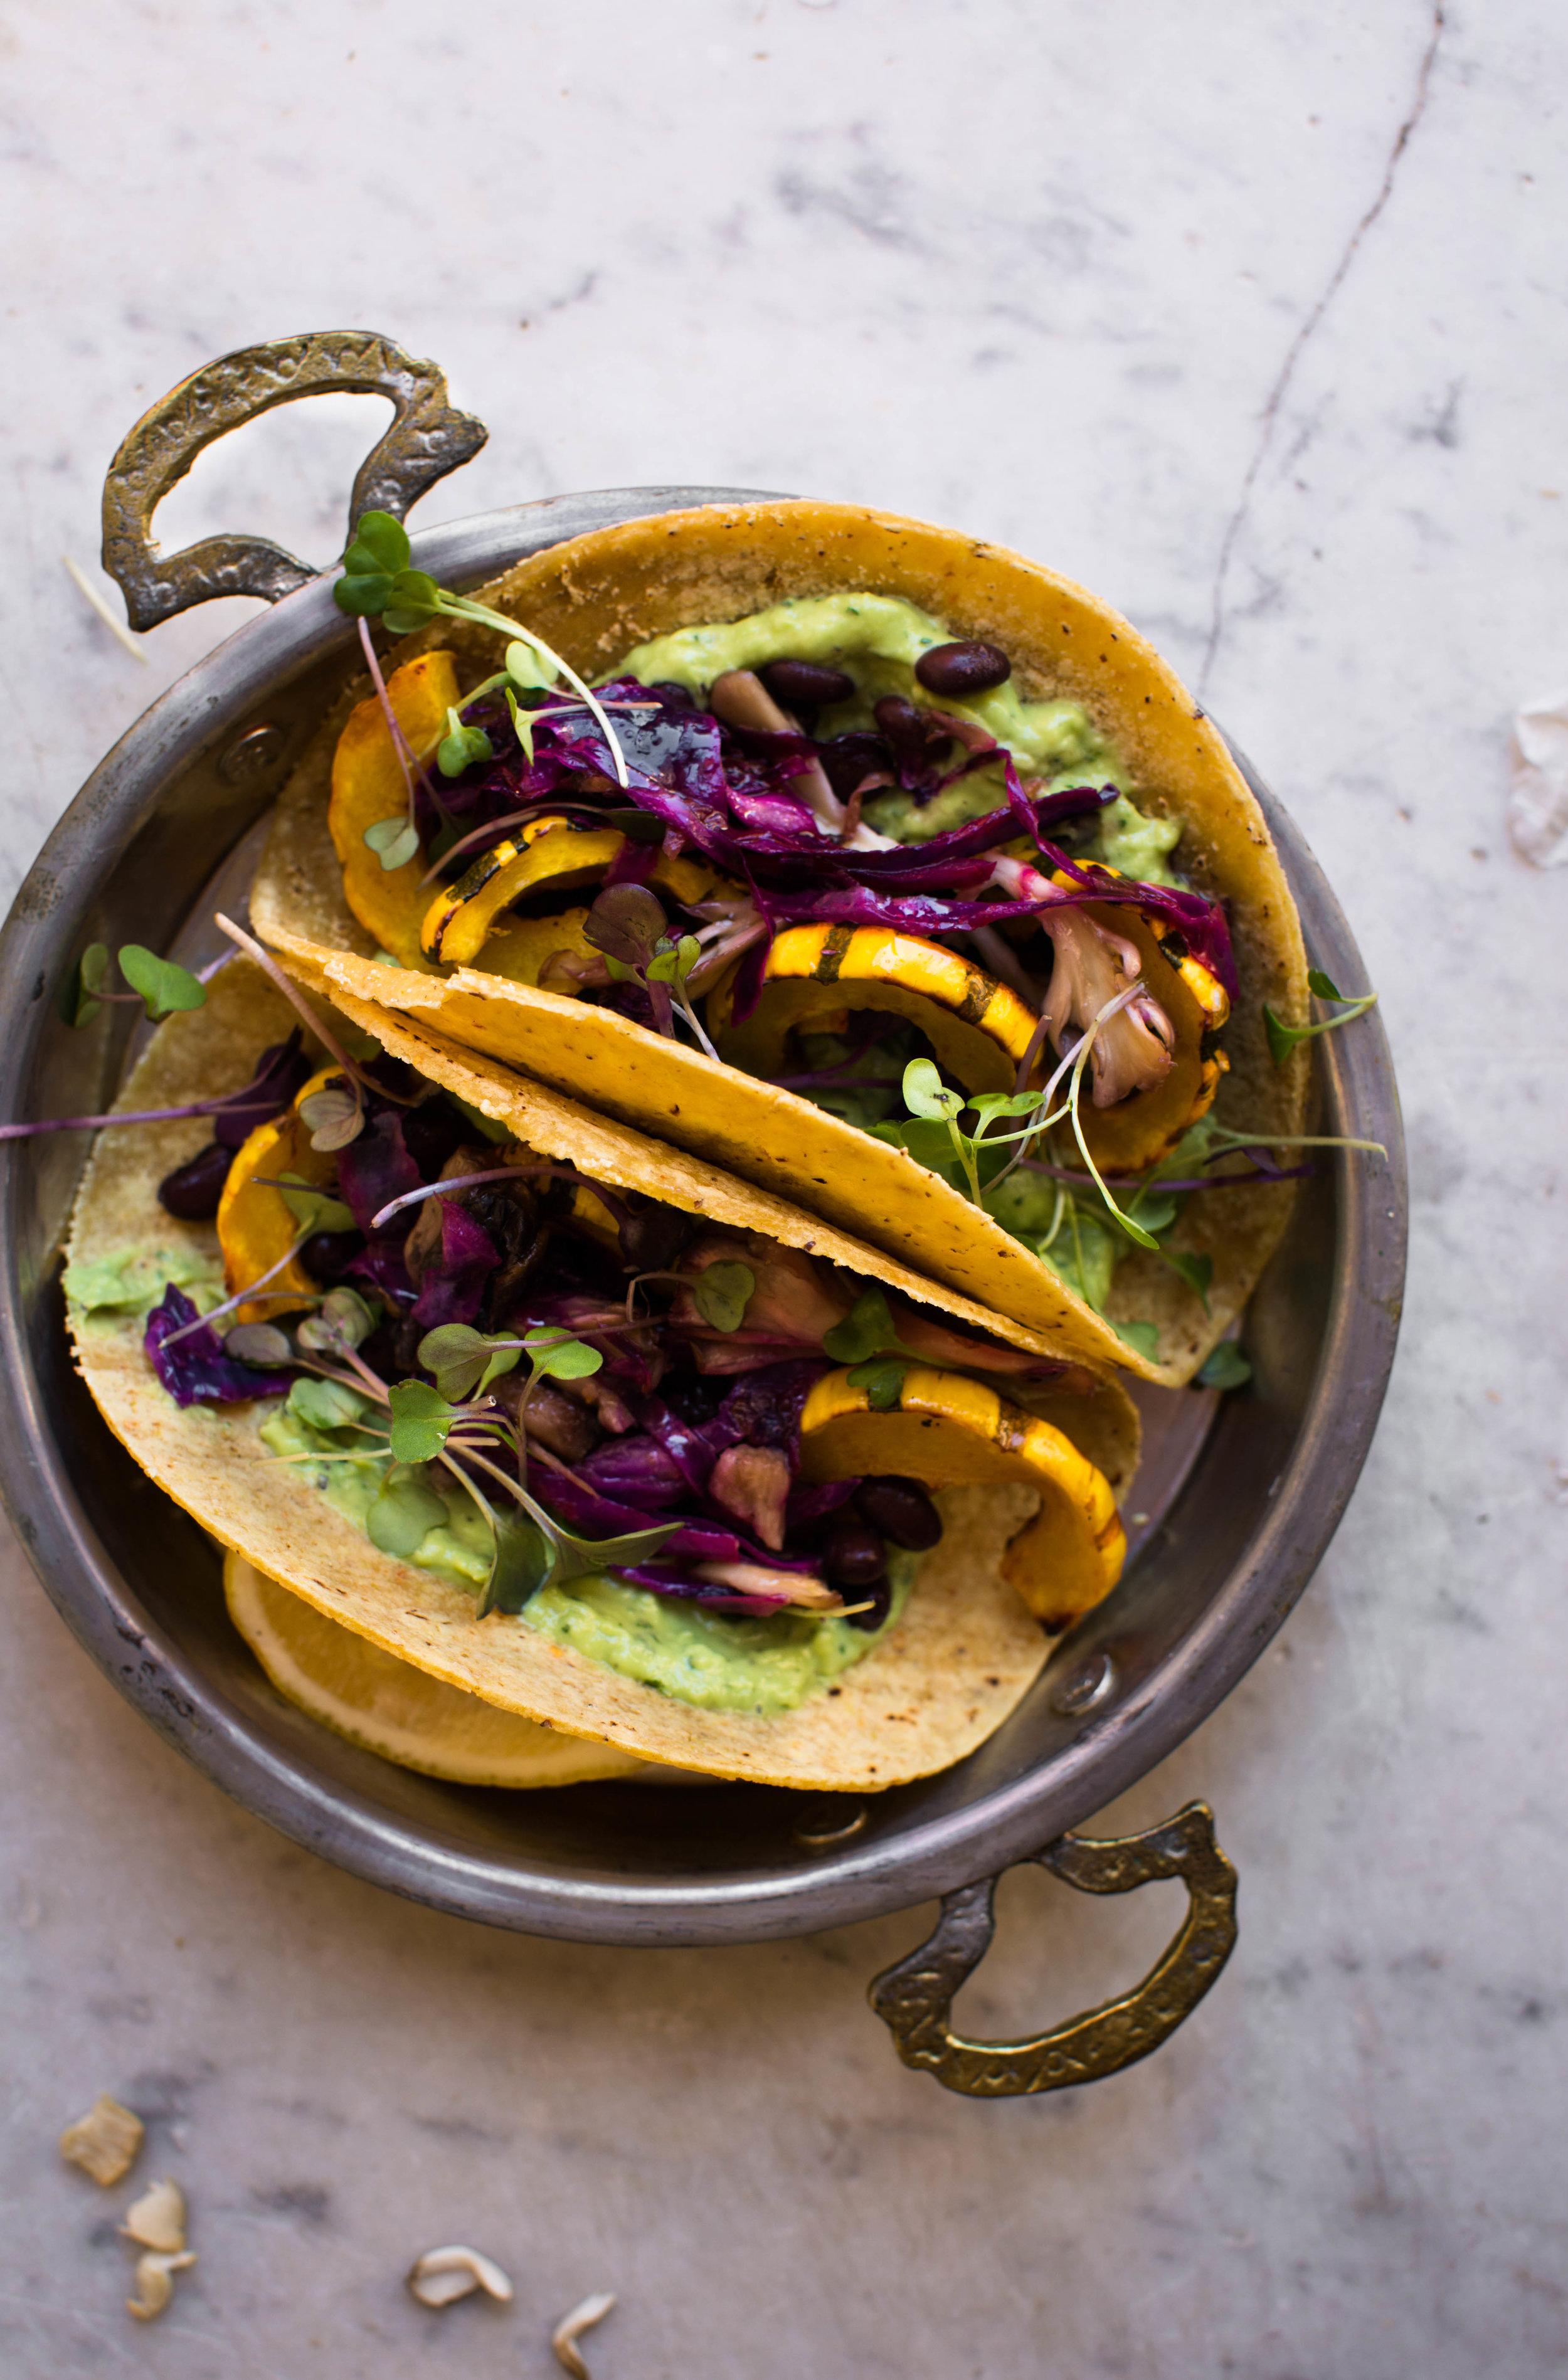 7-Fall-Breakfast-Tacos-with-Avocado-Cream-and-Squash | www.8thandlake.com